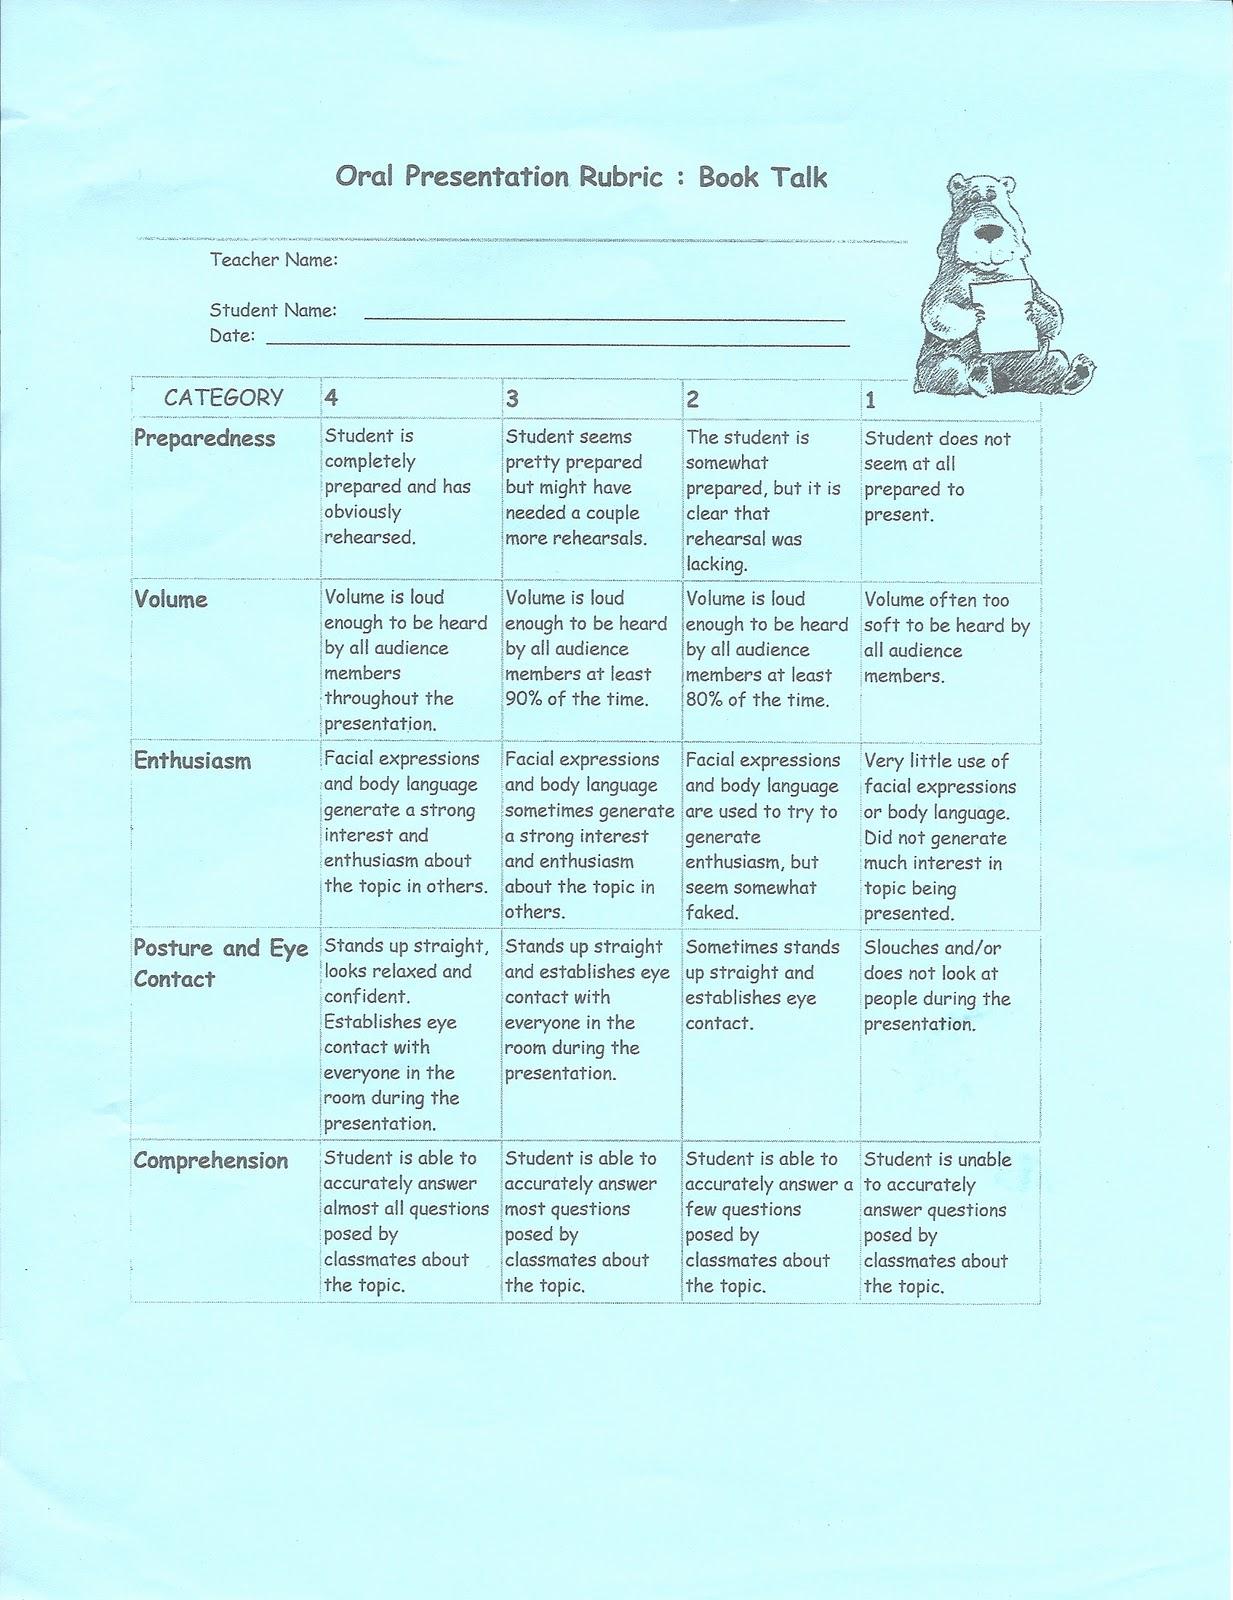 Oral Presentation Rubric For 5th Graders